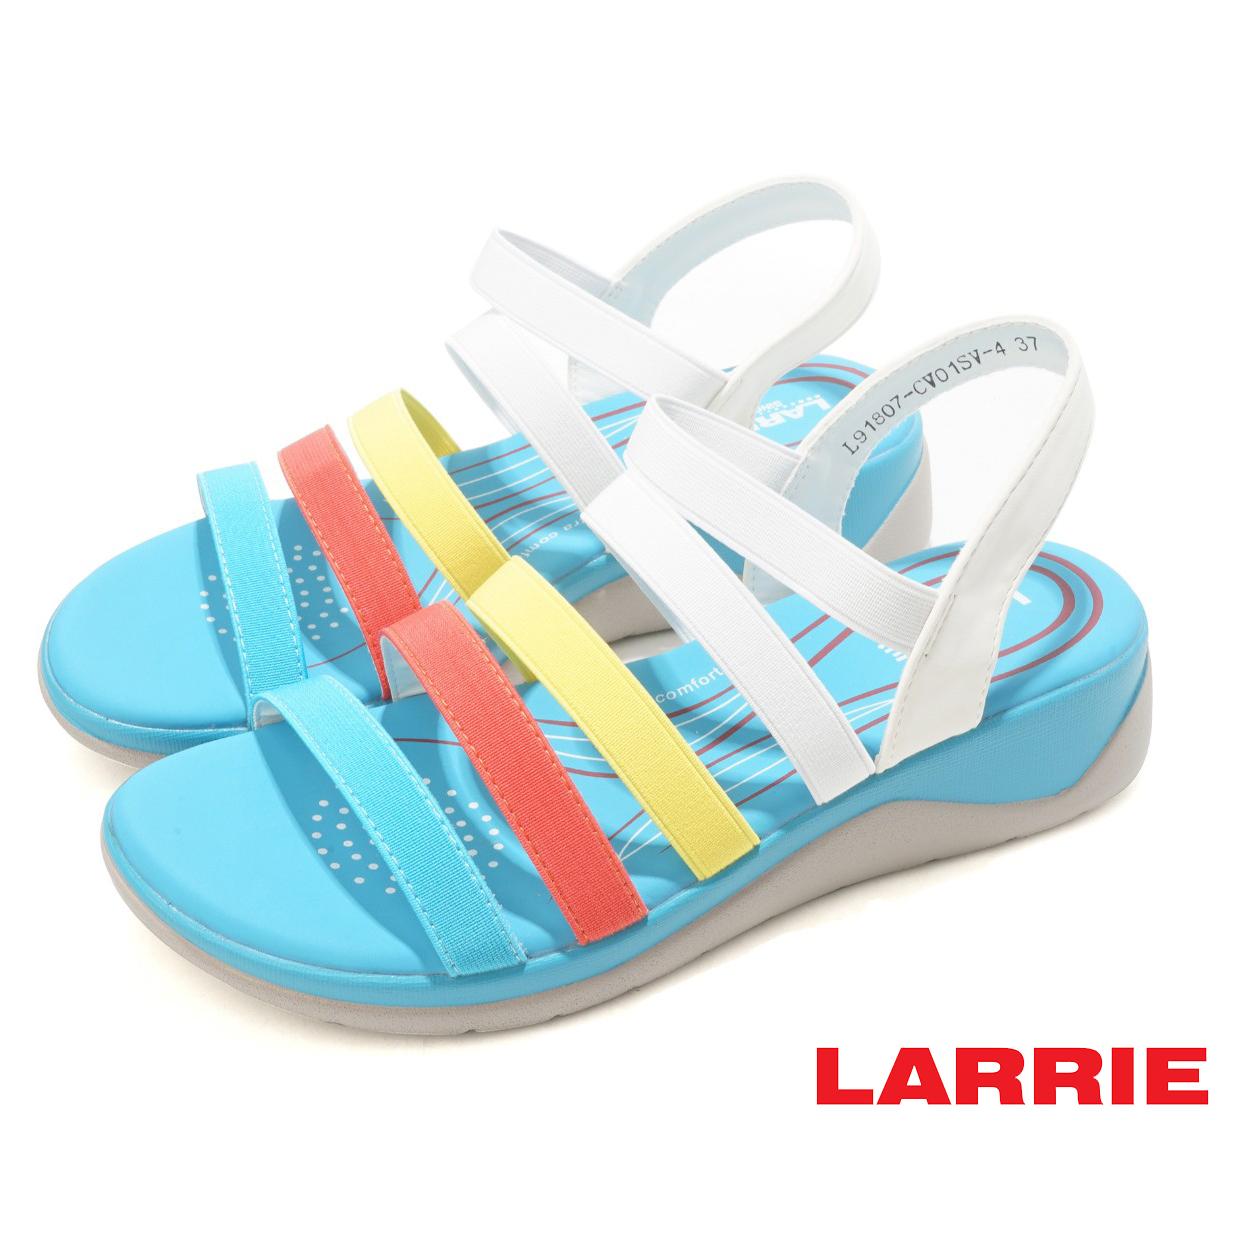 LARRIE Kasut WanitMultiple Strap Sporty Sandals - L91807-CV01SV